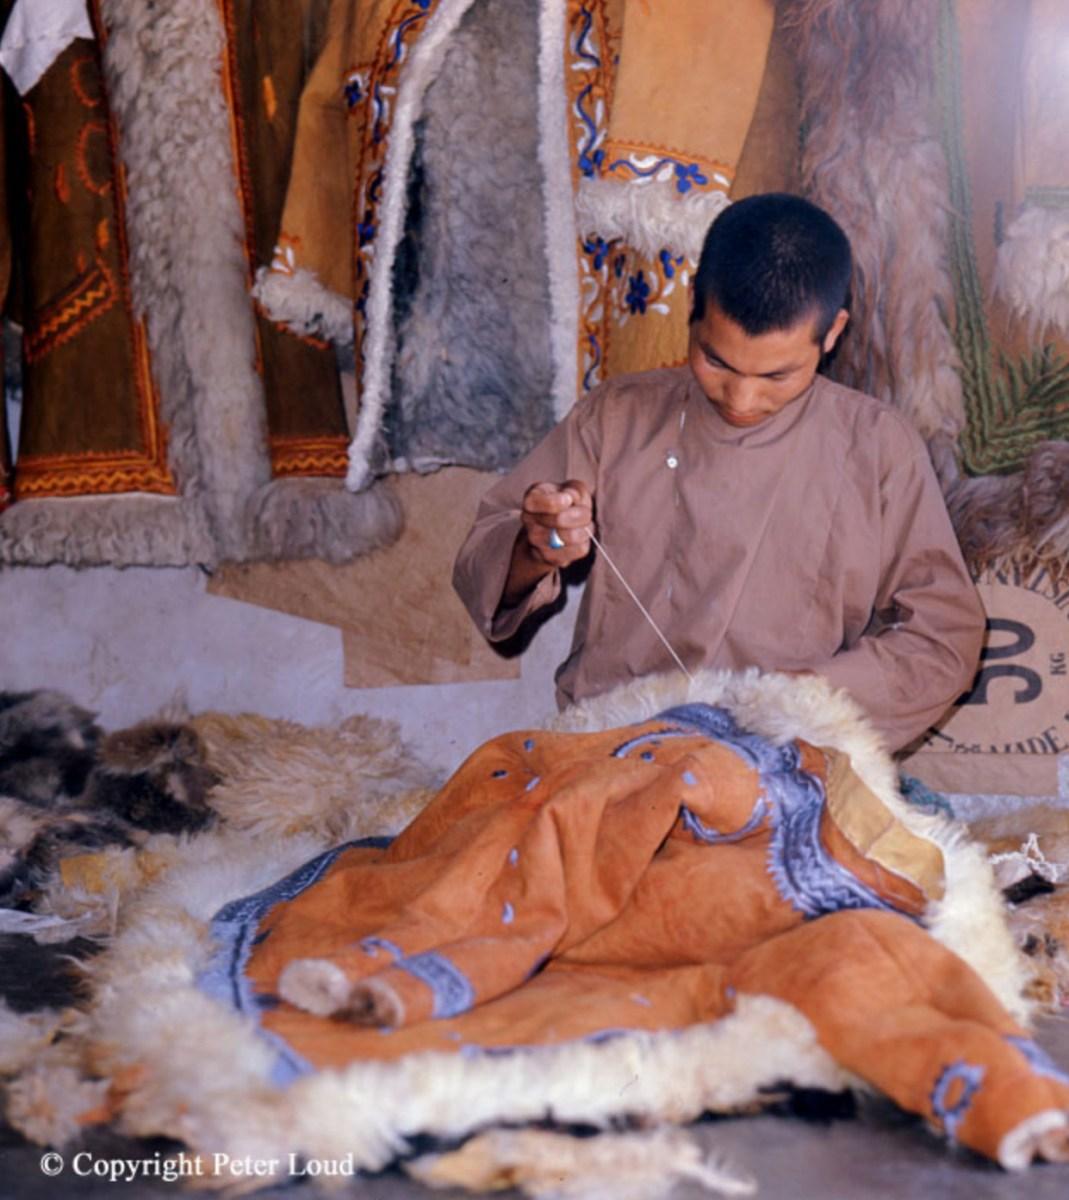 peter_loud_Afghan_Coat_Shop_1974_01